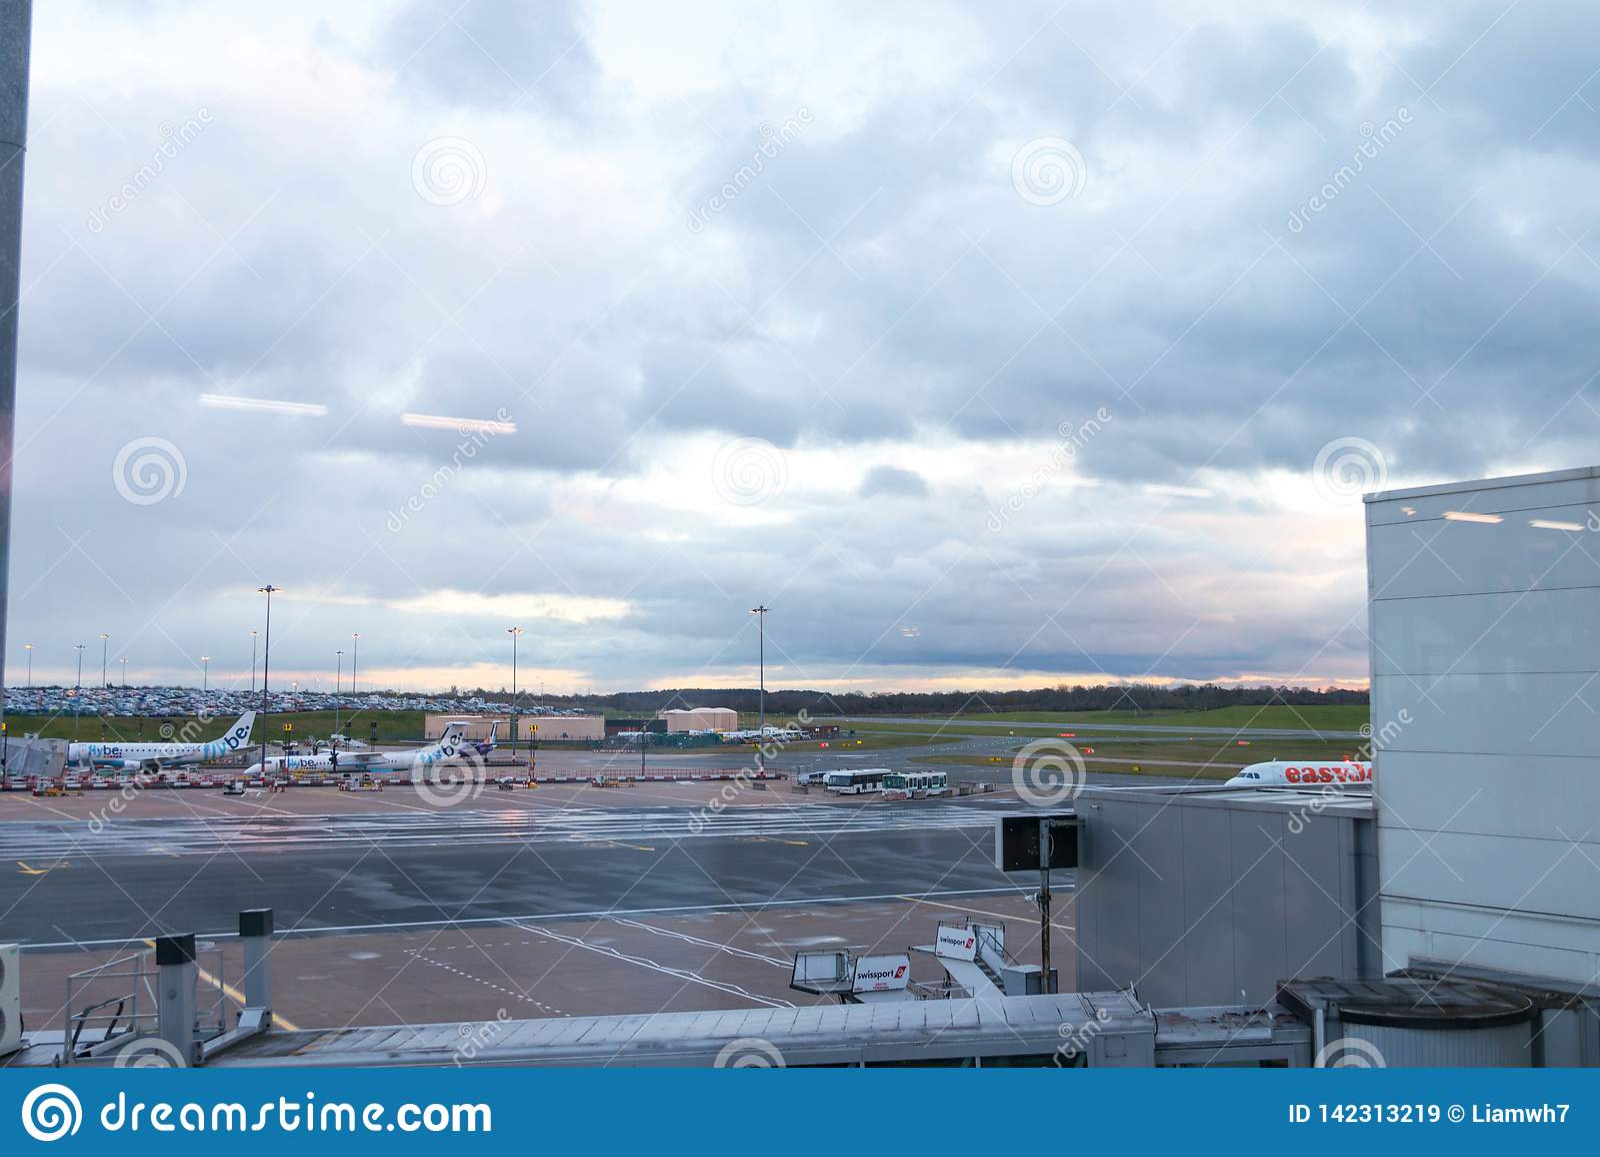 Birmingham/ UK - 03.03.19 : Birmingham Airport tarmac gates airplane